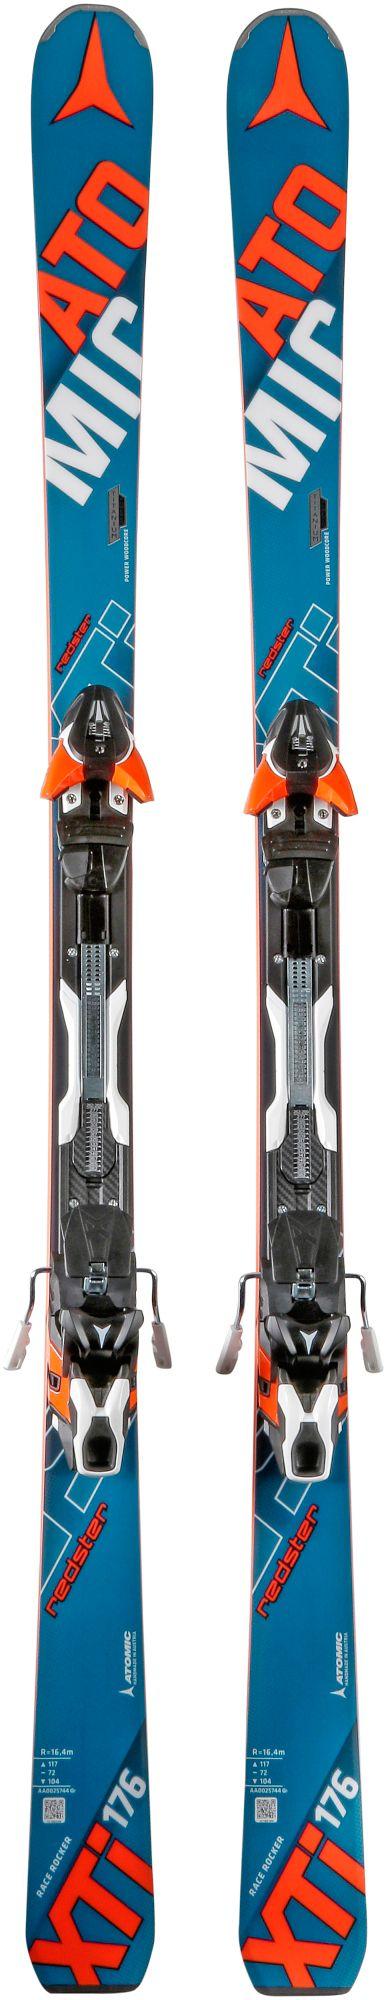 Redster XTI Race Carver mehrfarbig, Größe 176